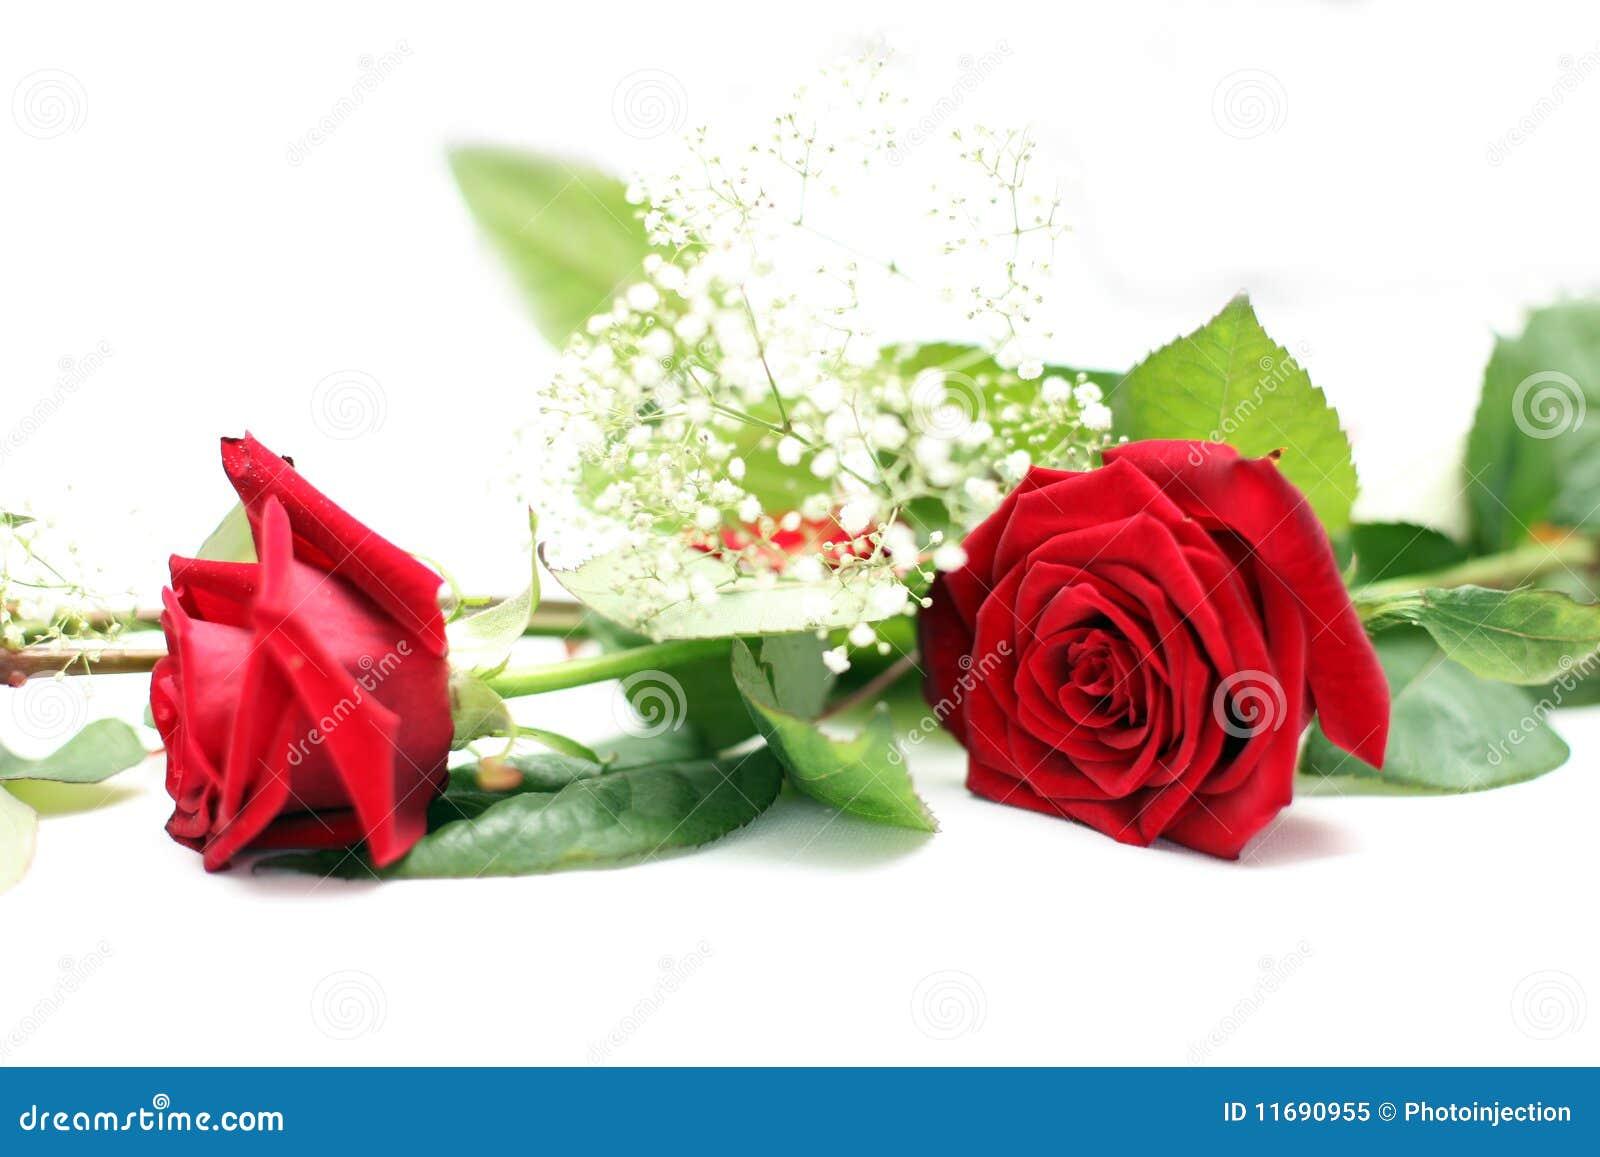 Wedding Table Decoration Rose Stock Image - Image of fine ...